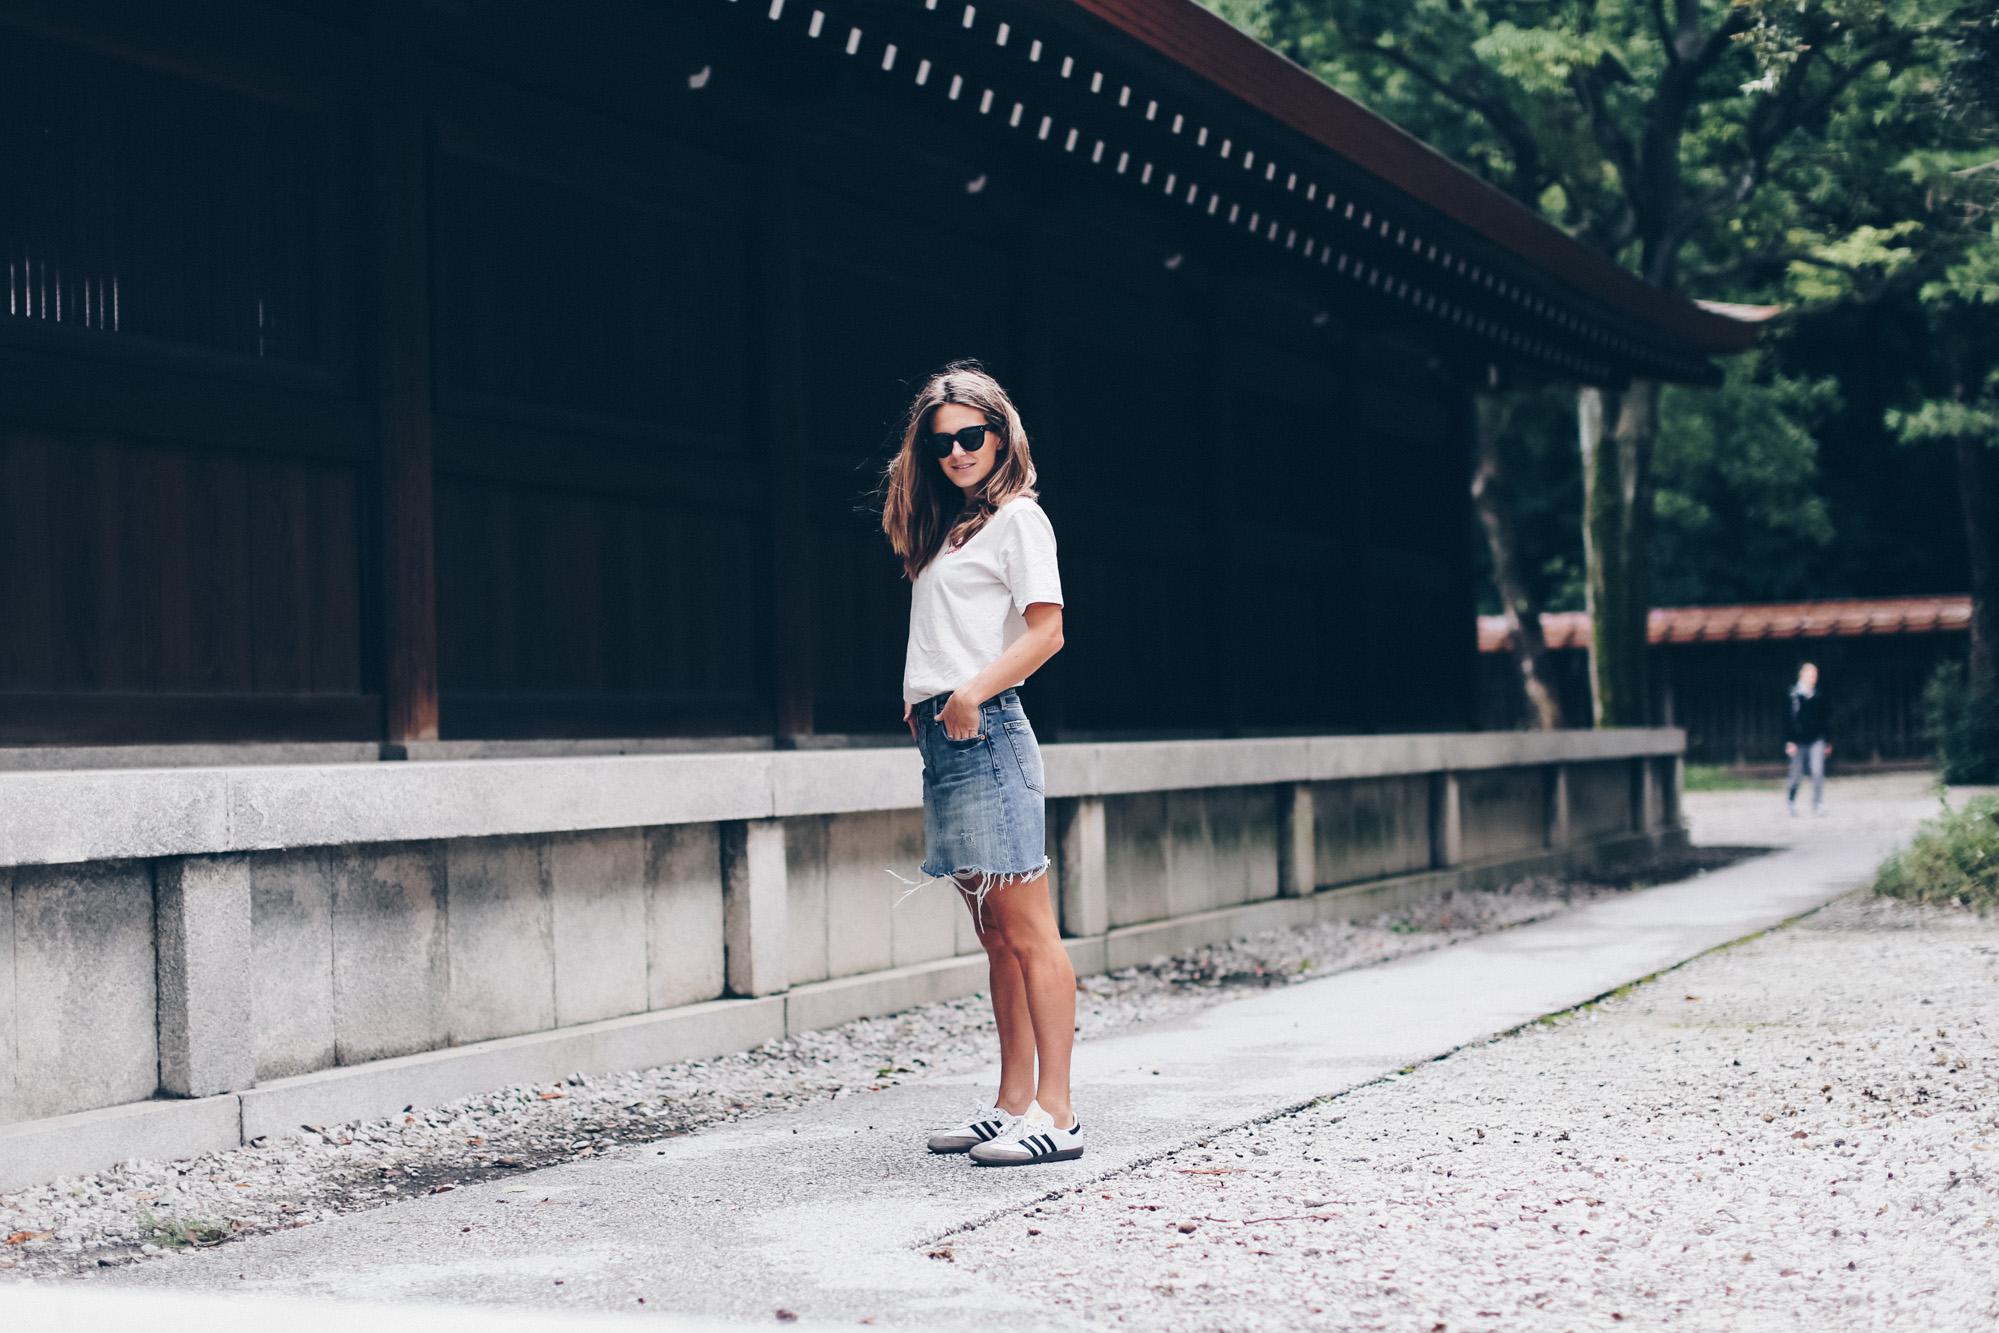 Teta Power en Tokyo  Adidas  Adidas Samba  Celine  Clochet